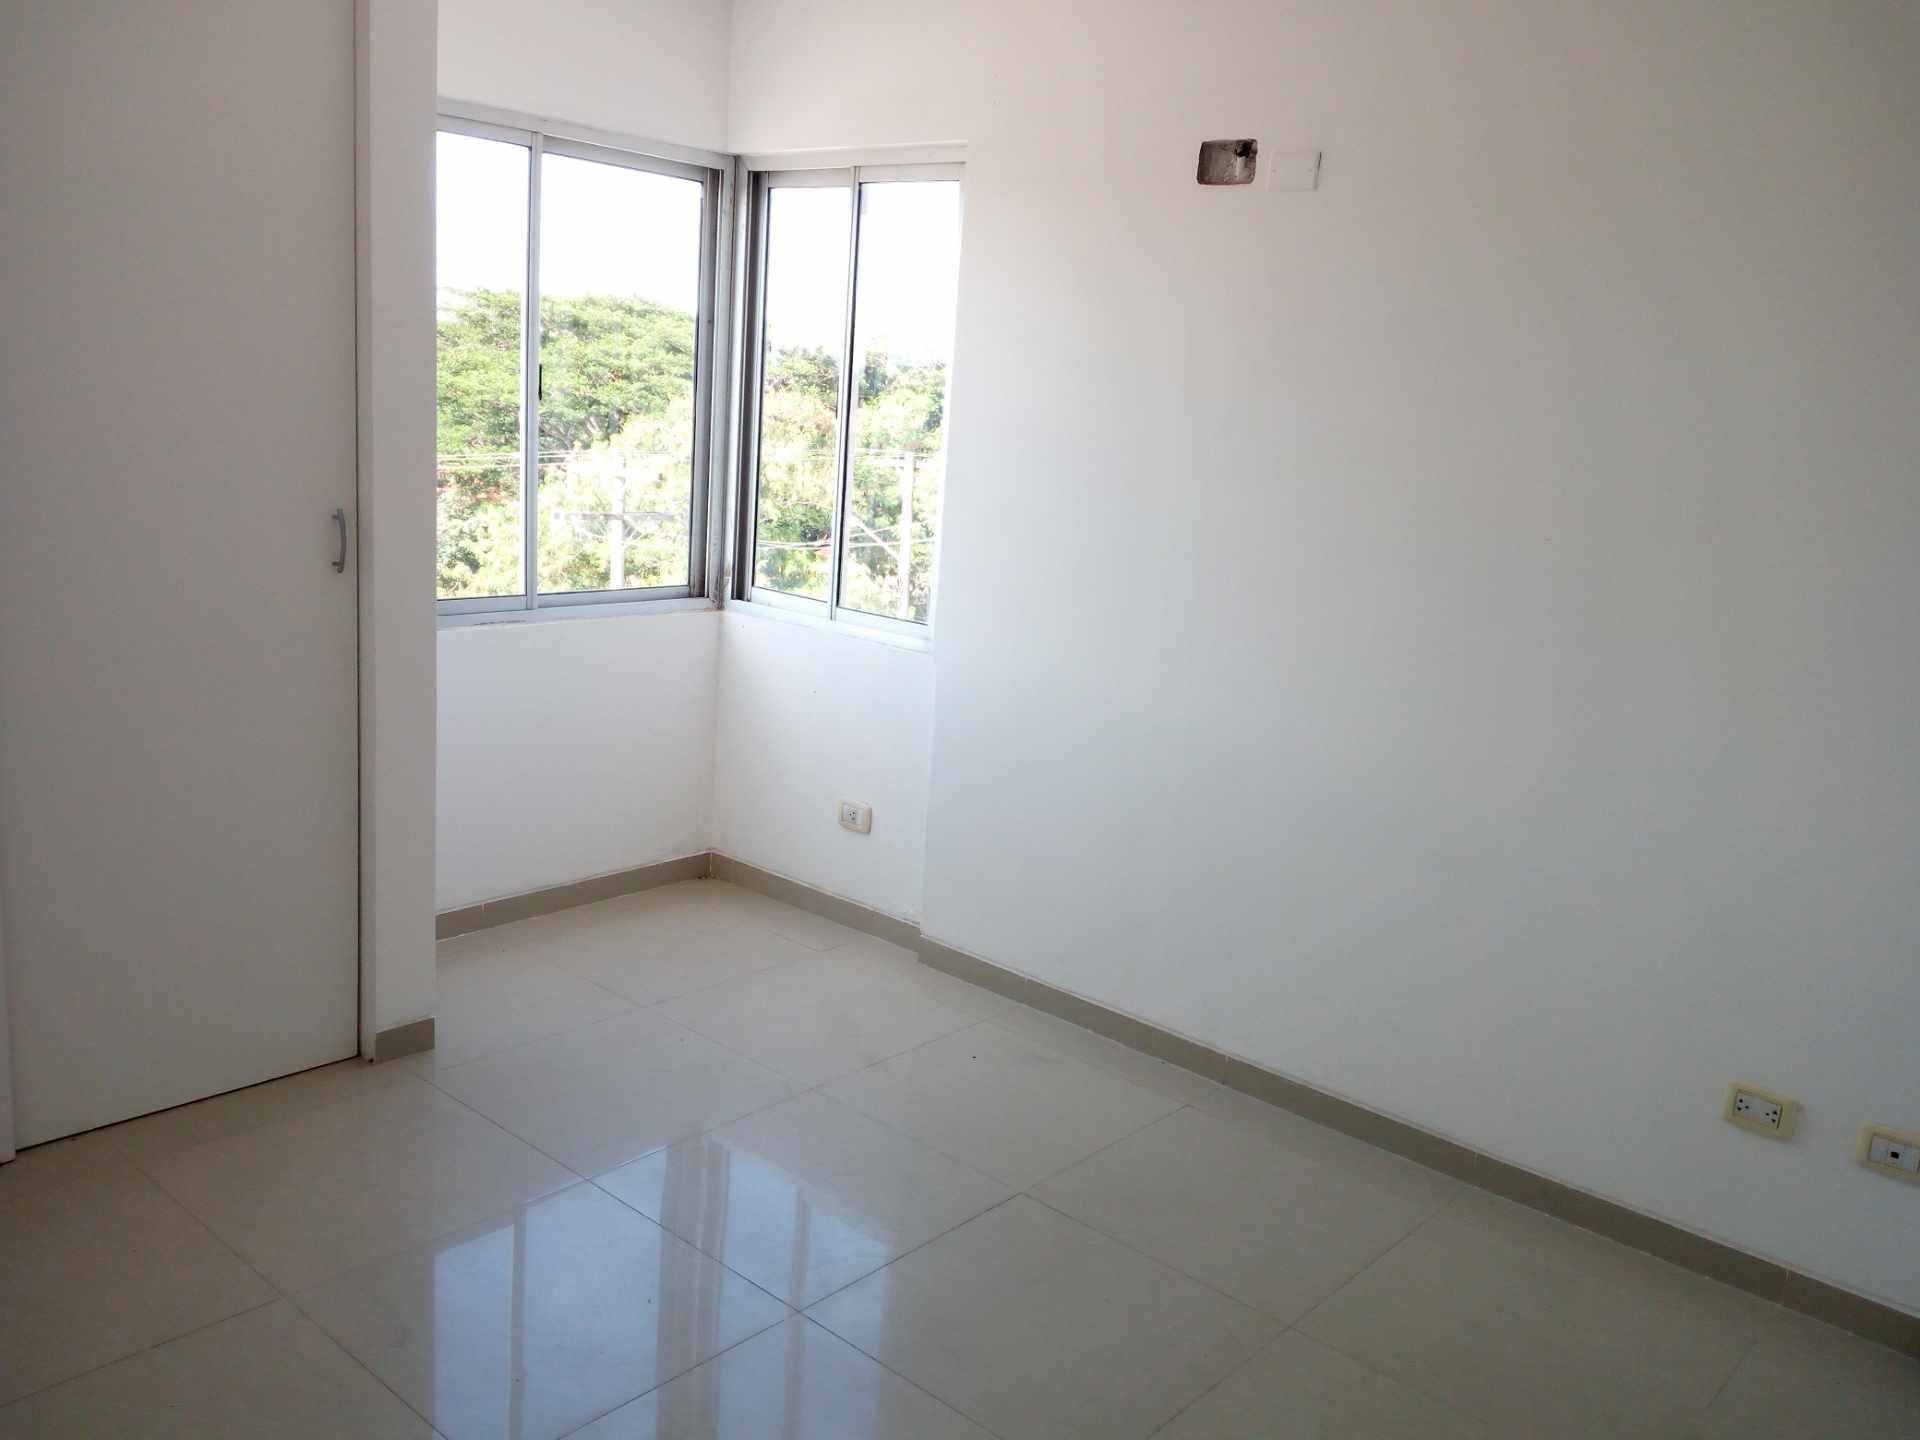 Departamento en Venta Entre 3er y 2do Anillo, Av. Guapay (Canal Cotoca) Foto 7